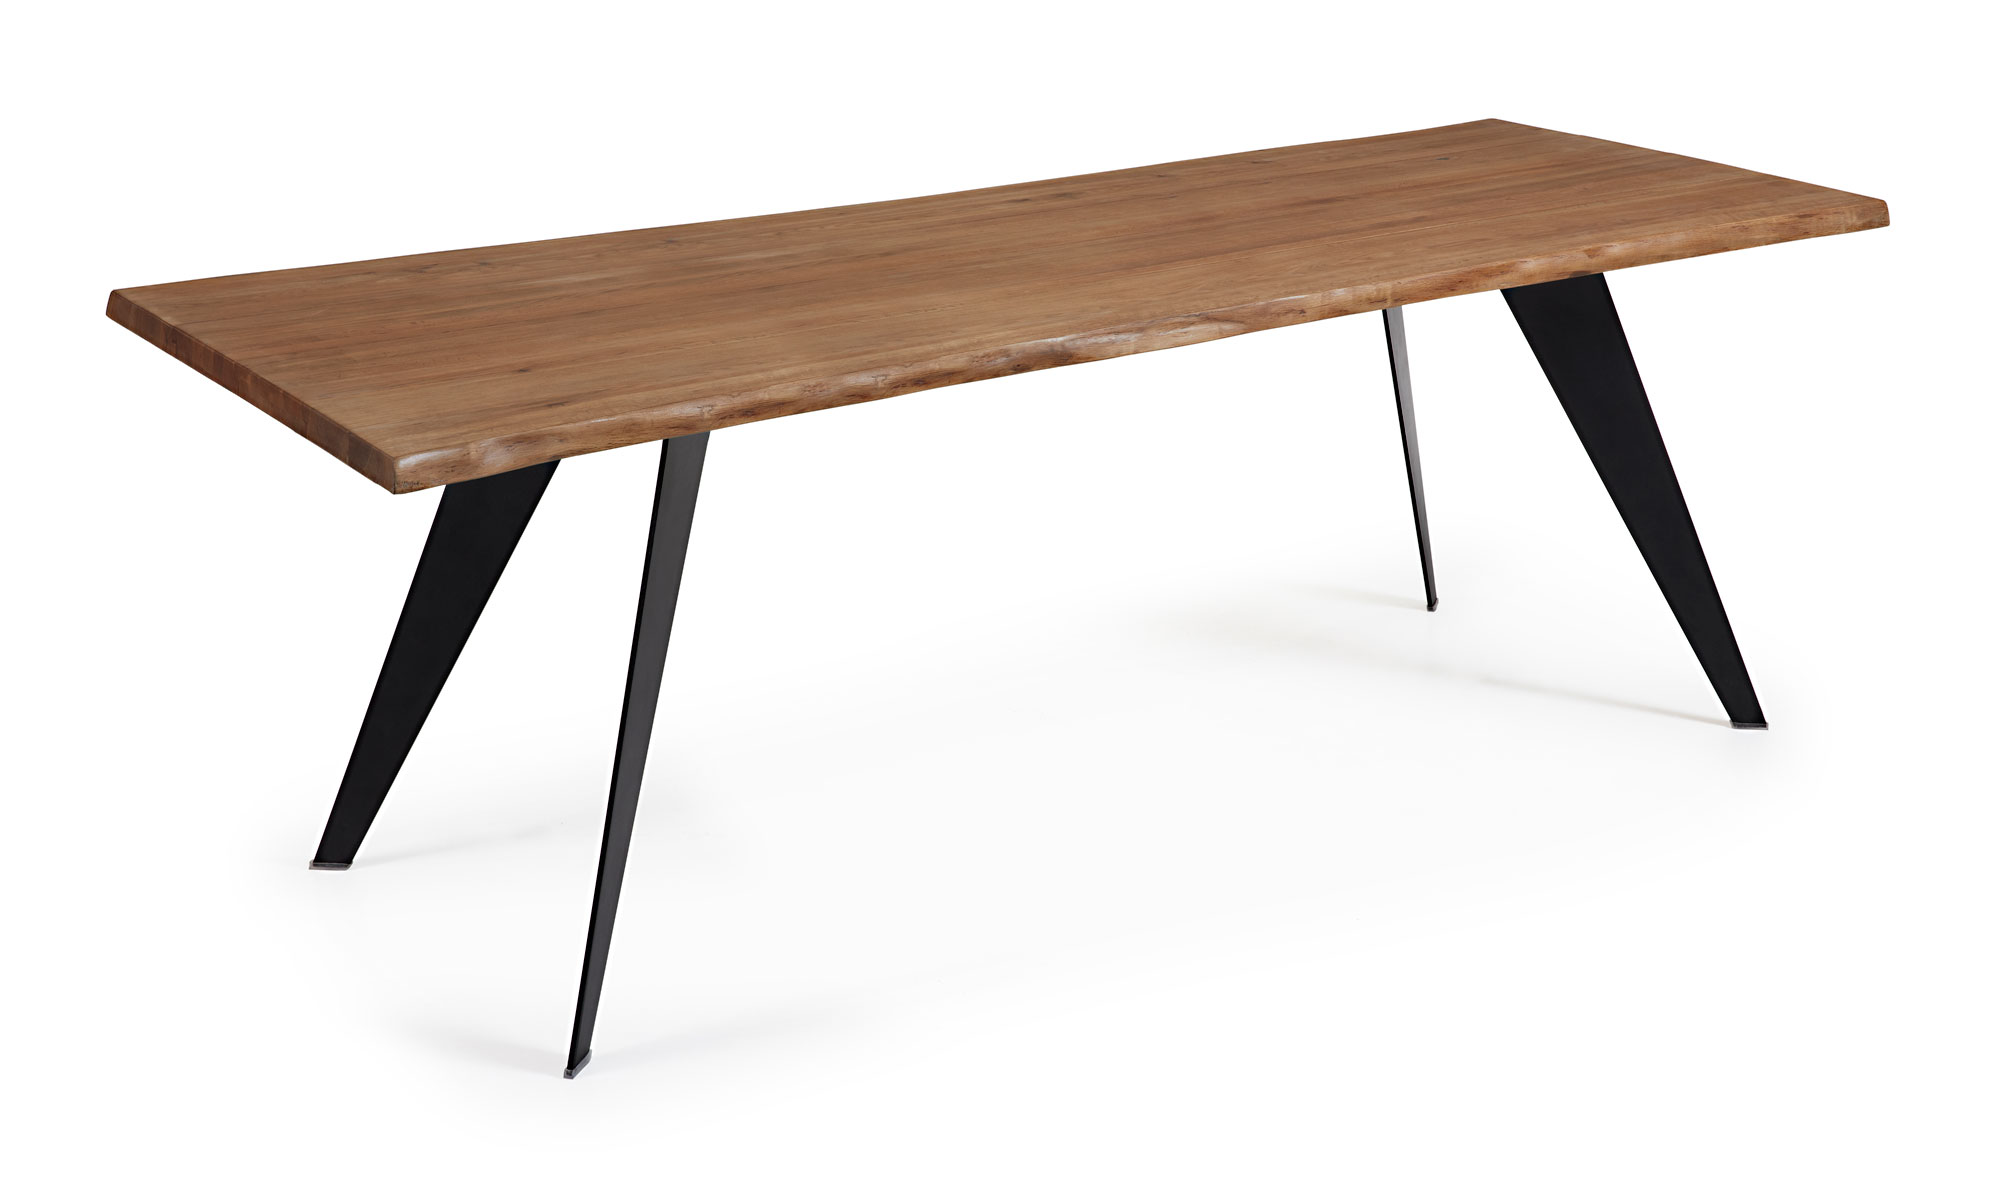 Mesa comedor roble antiguo moderna nack no disponible en for Muebles de roble antiguos